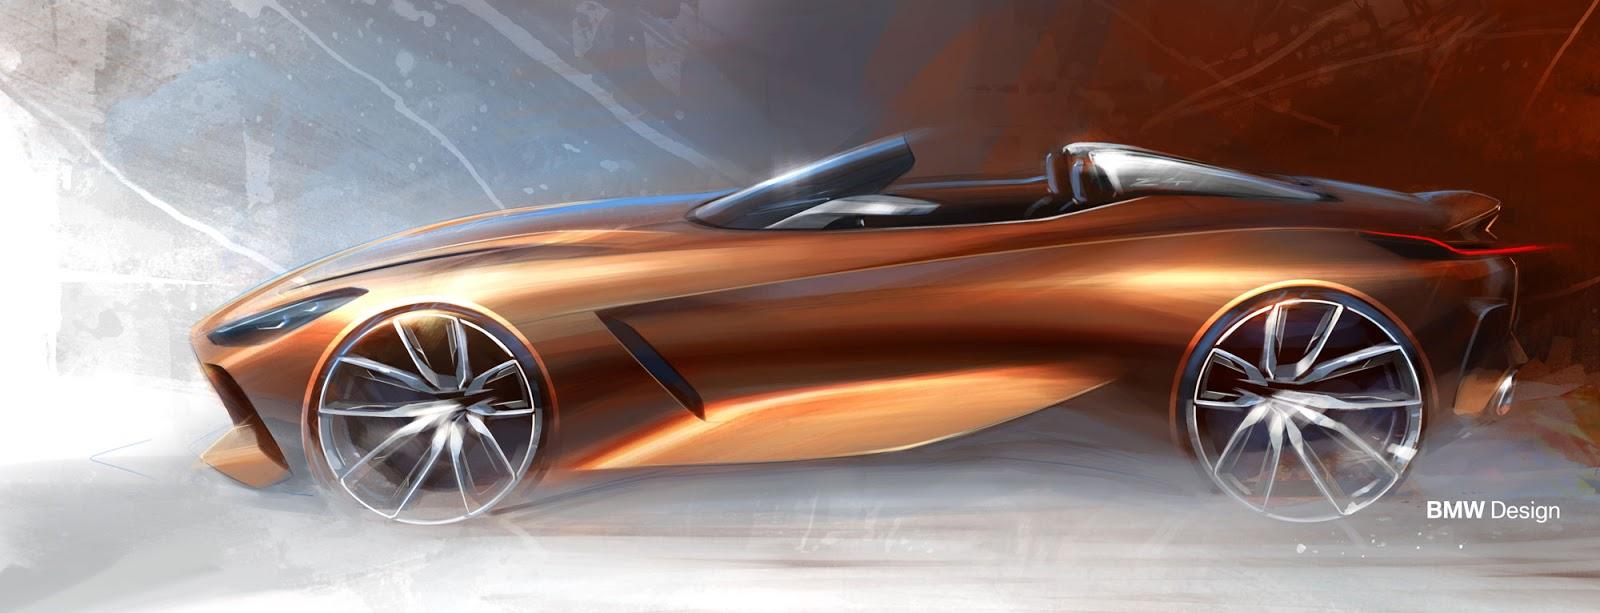 BMW Z4 sketch by Calvin Luk side view